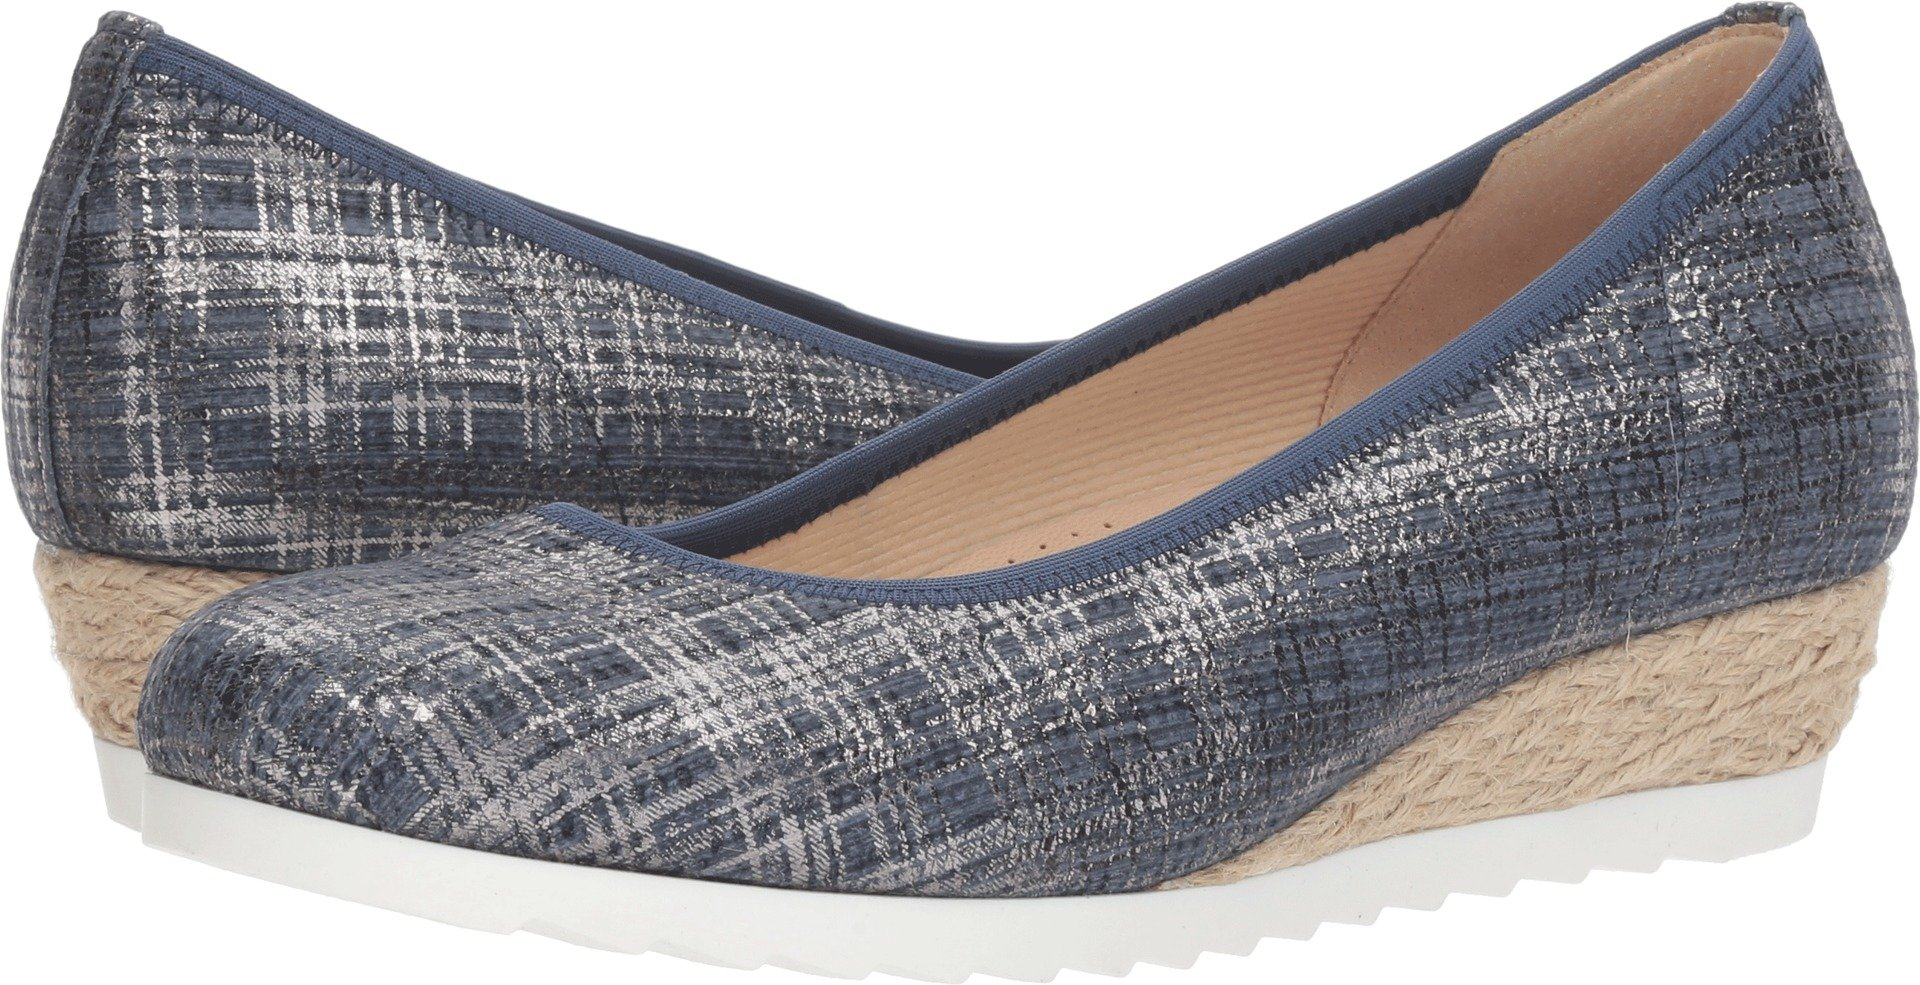 Gabor Women's 82.641 Jeans Cotton Metallic 5.5 B UK